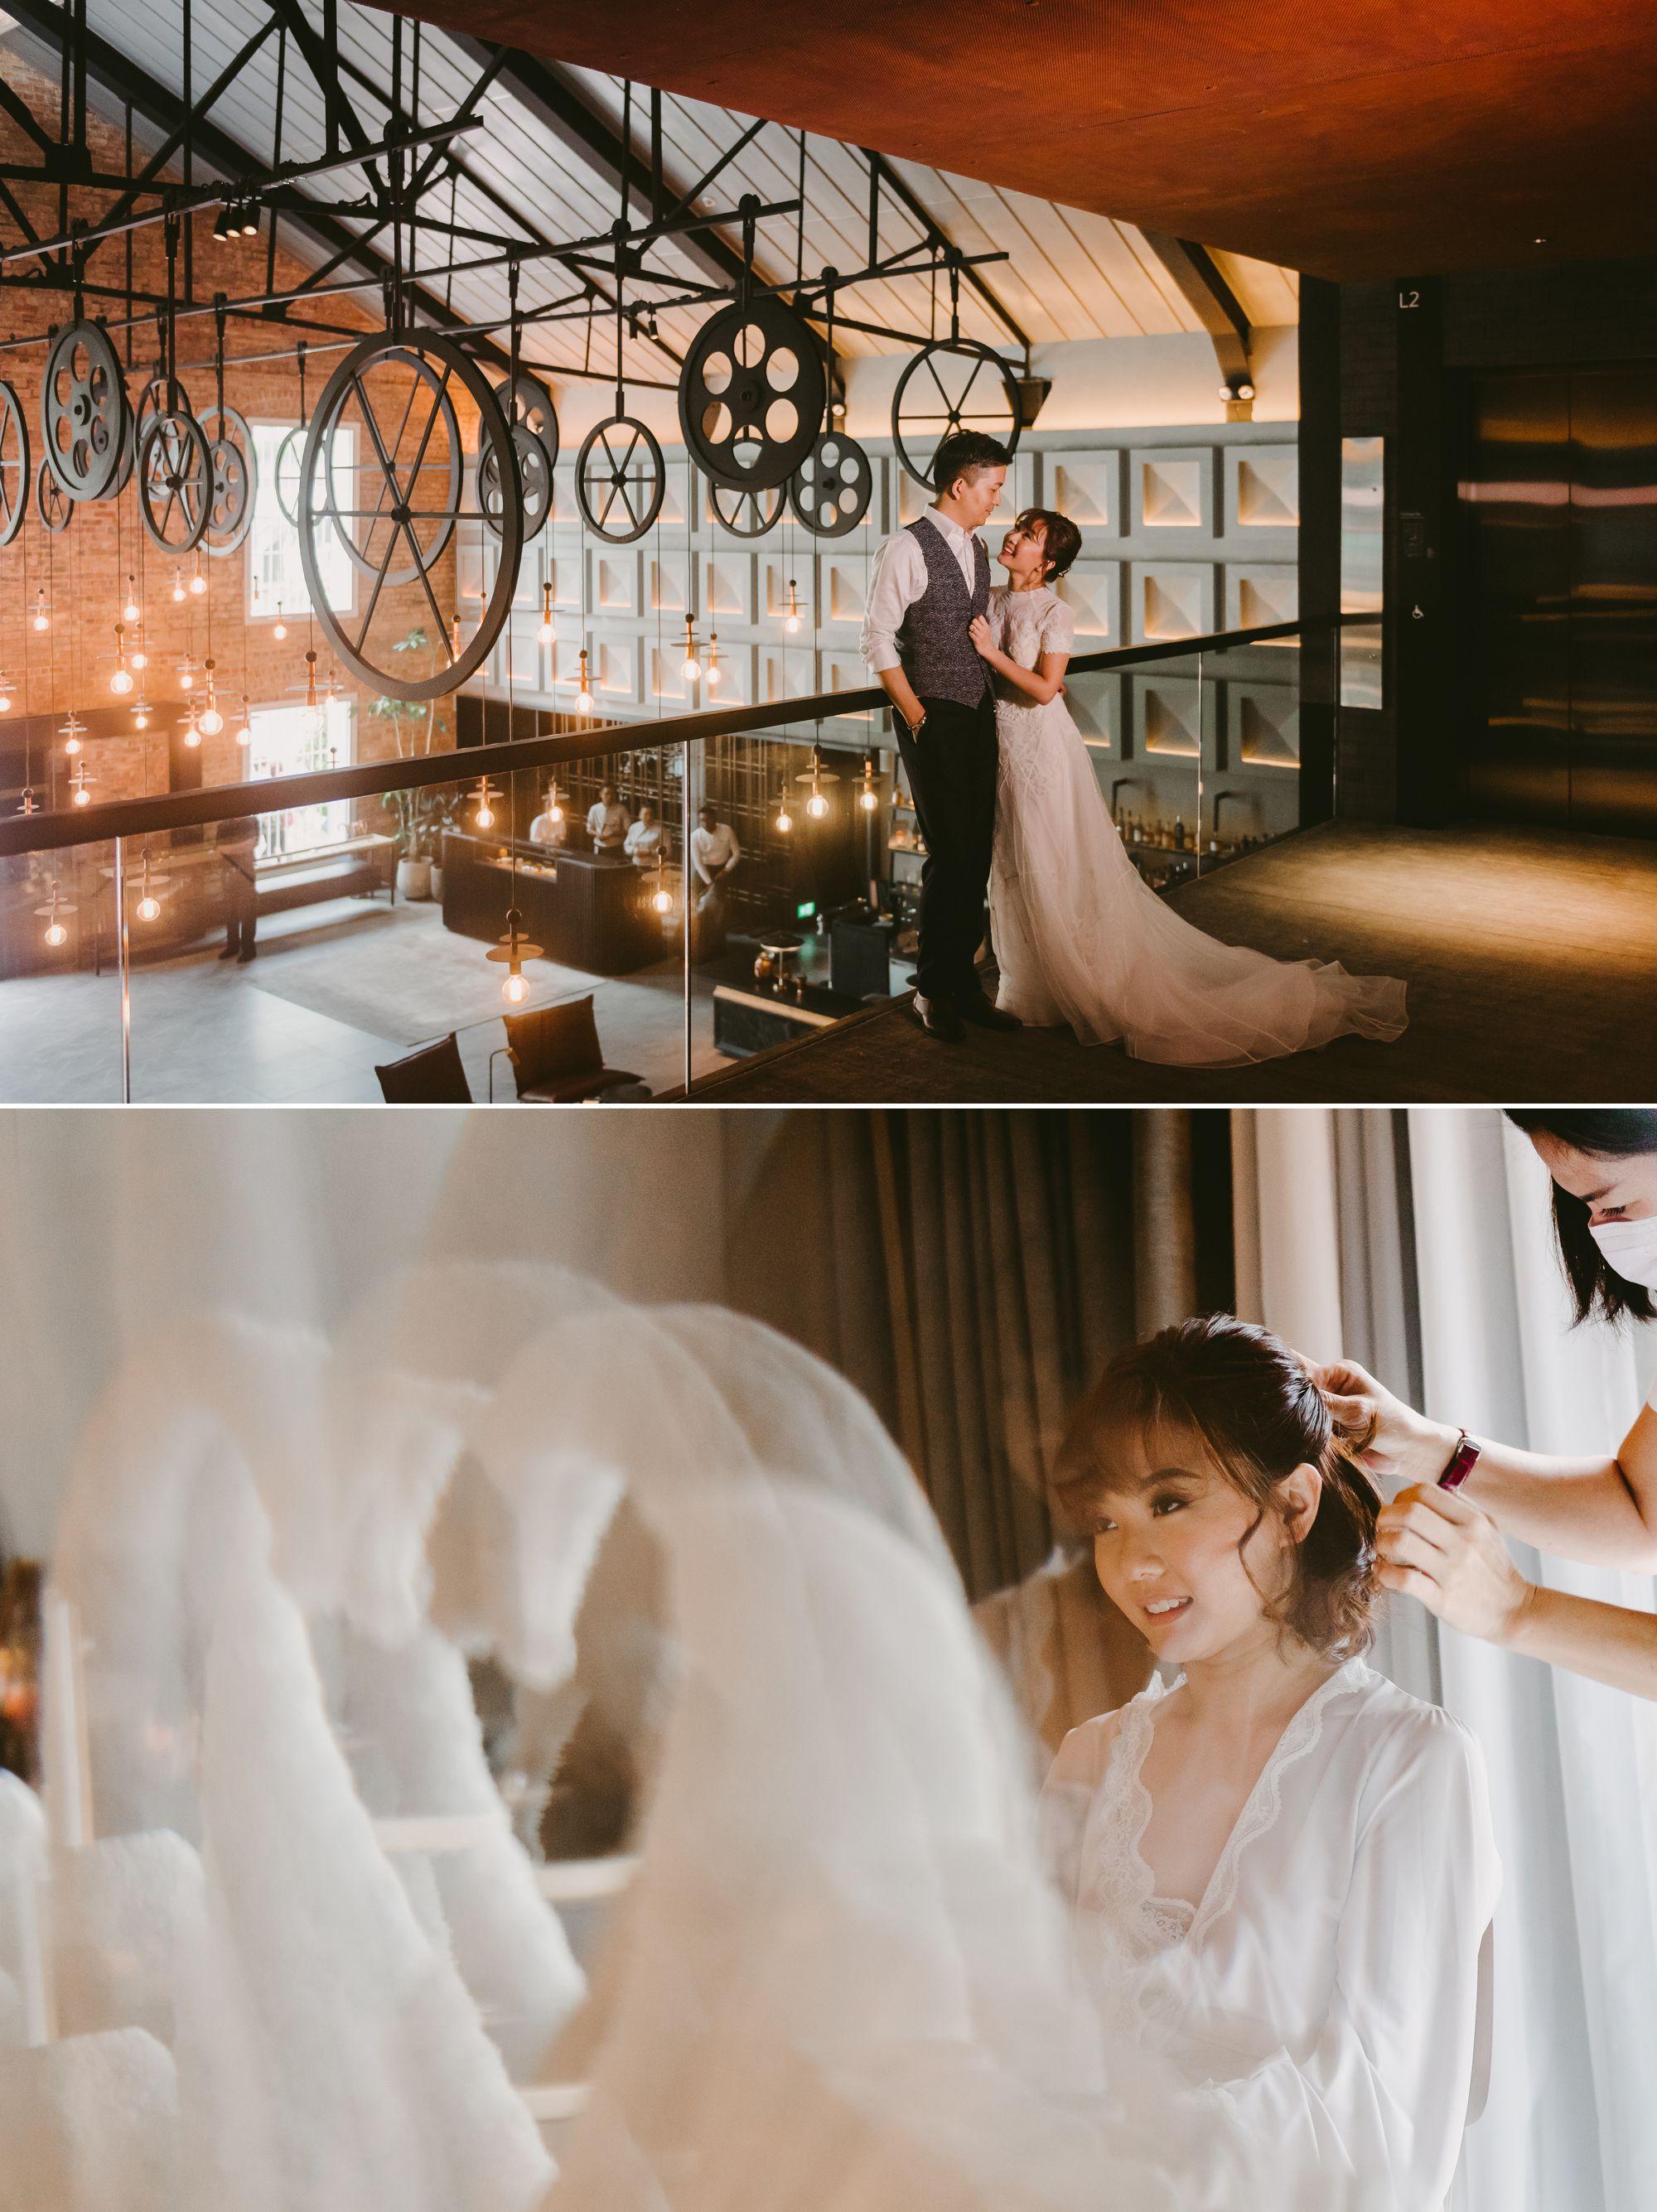 wedding_photography 1.jpg